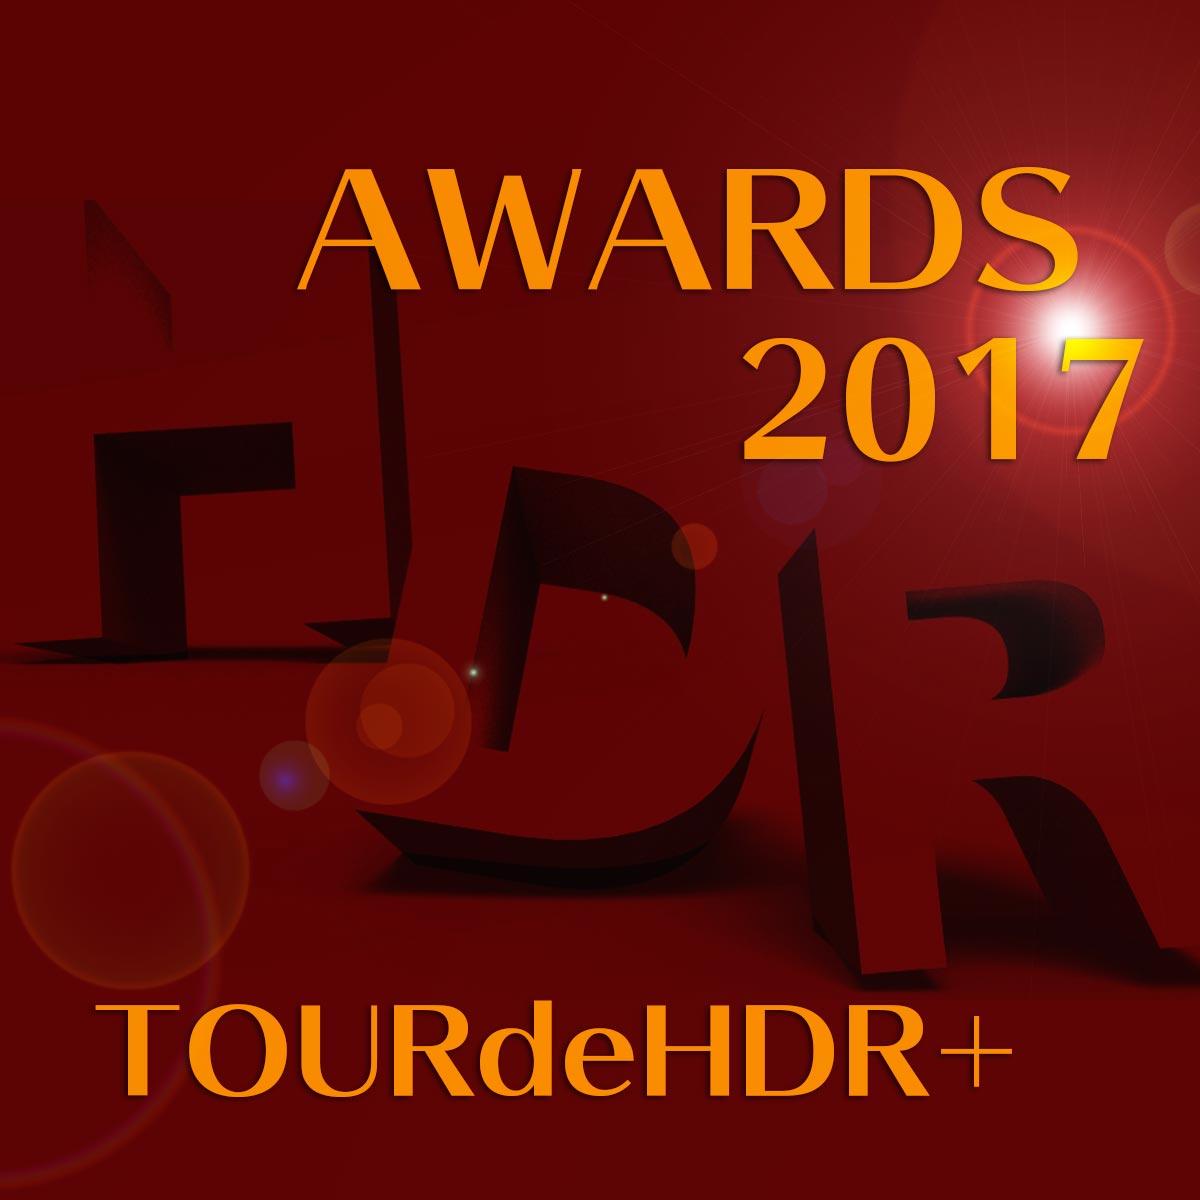 TOURdeHDR+2017AWARDS